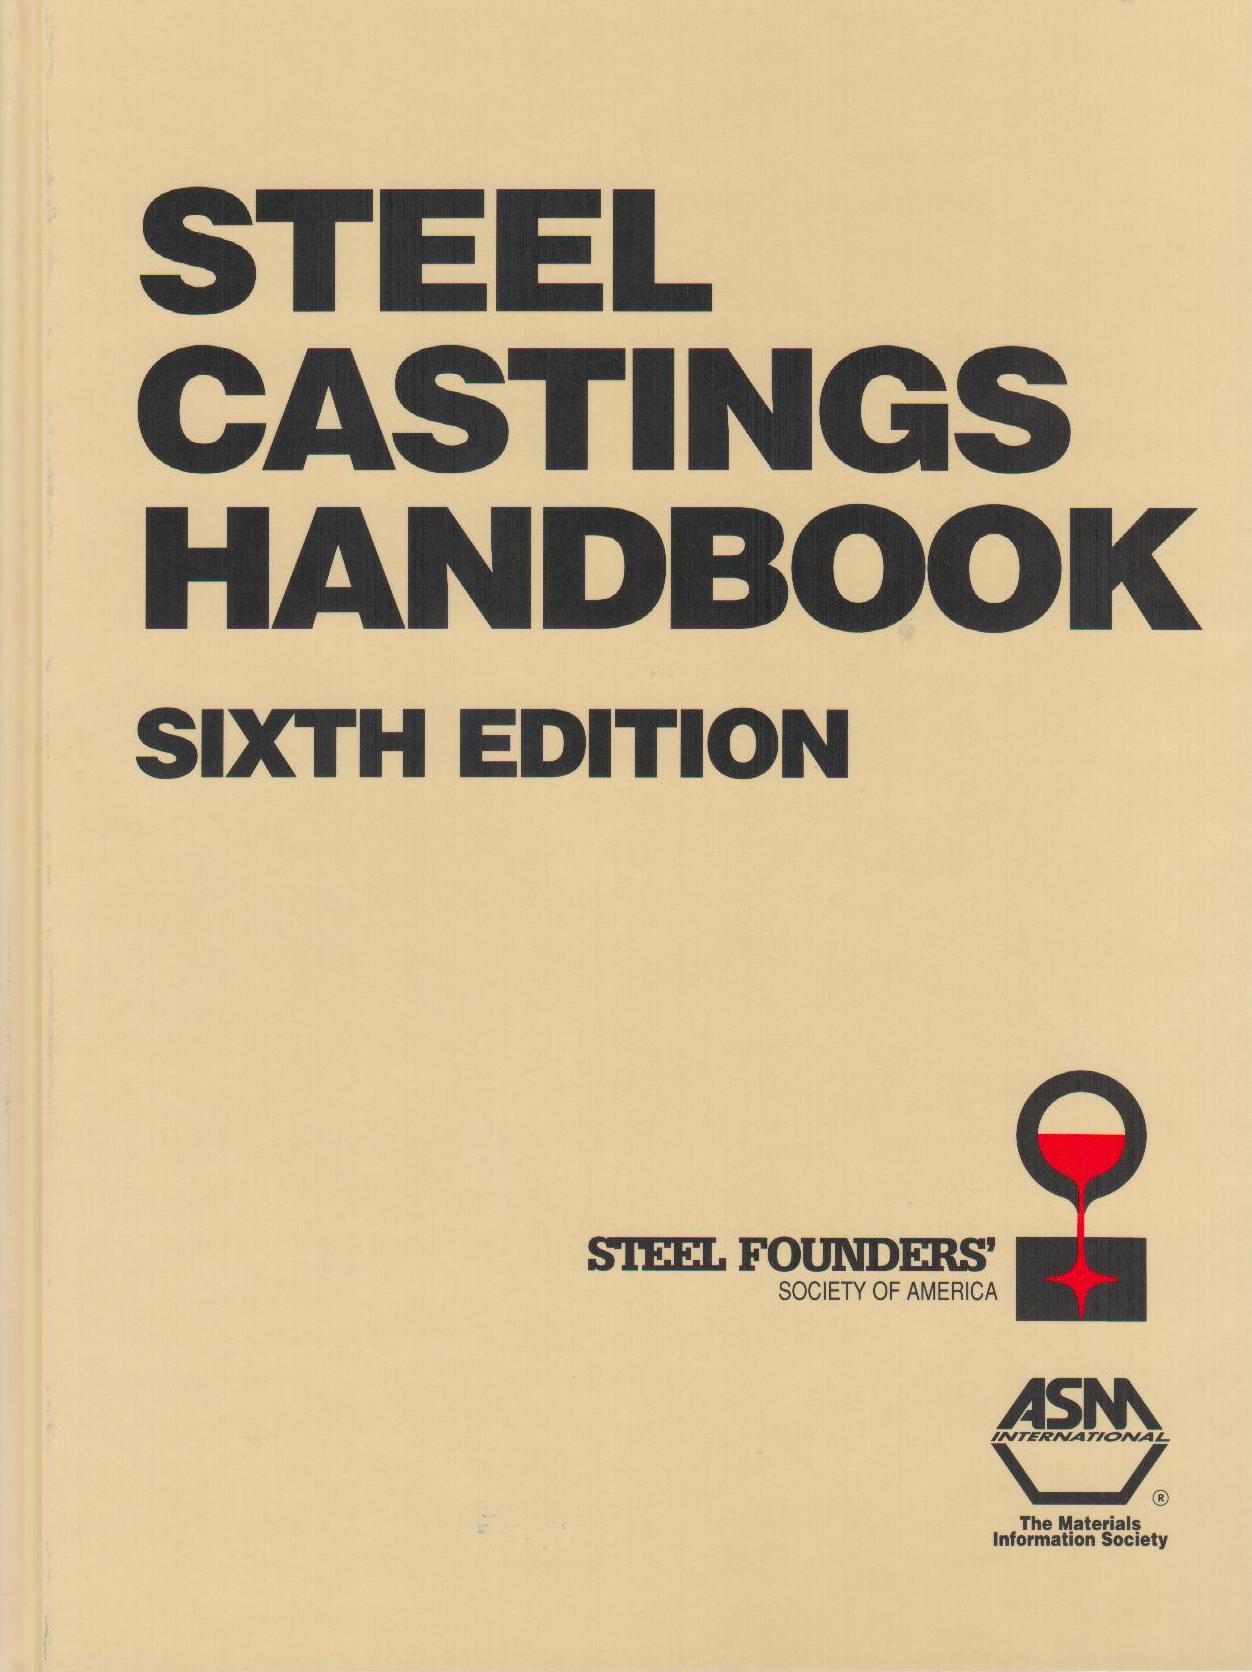 Steel Castings Handbook  6th Edition  Asm  0871705567